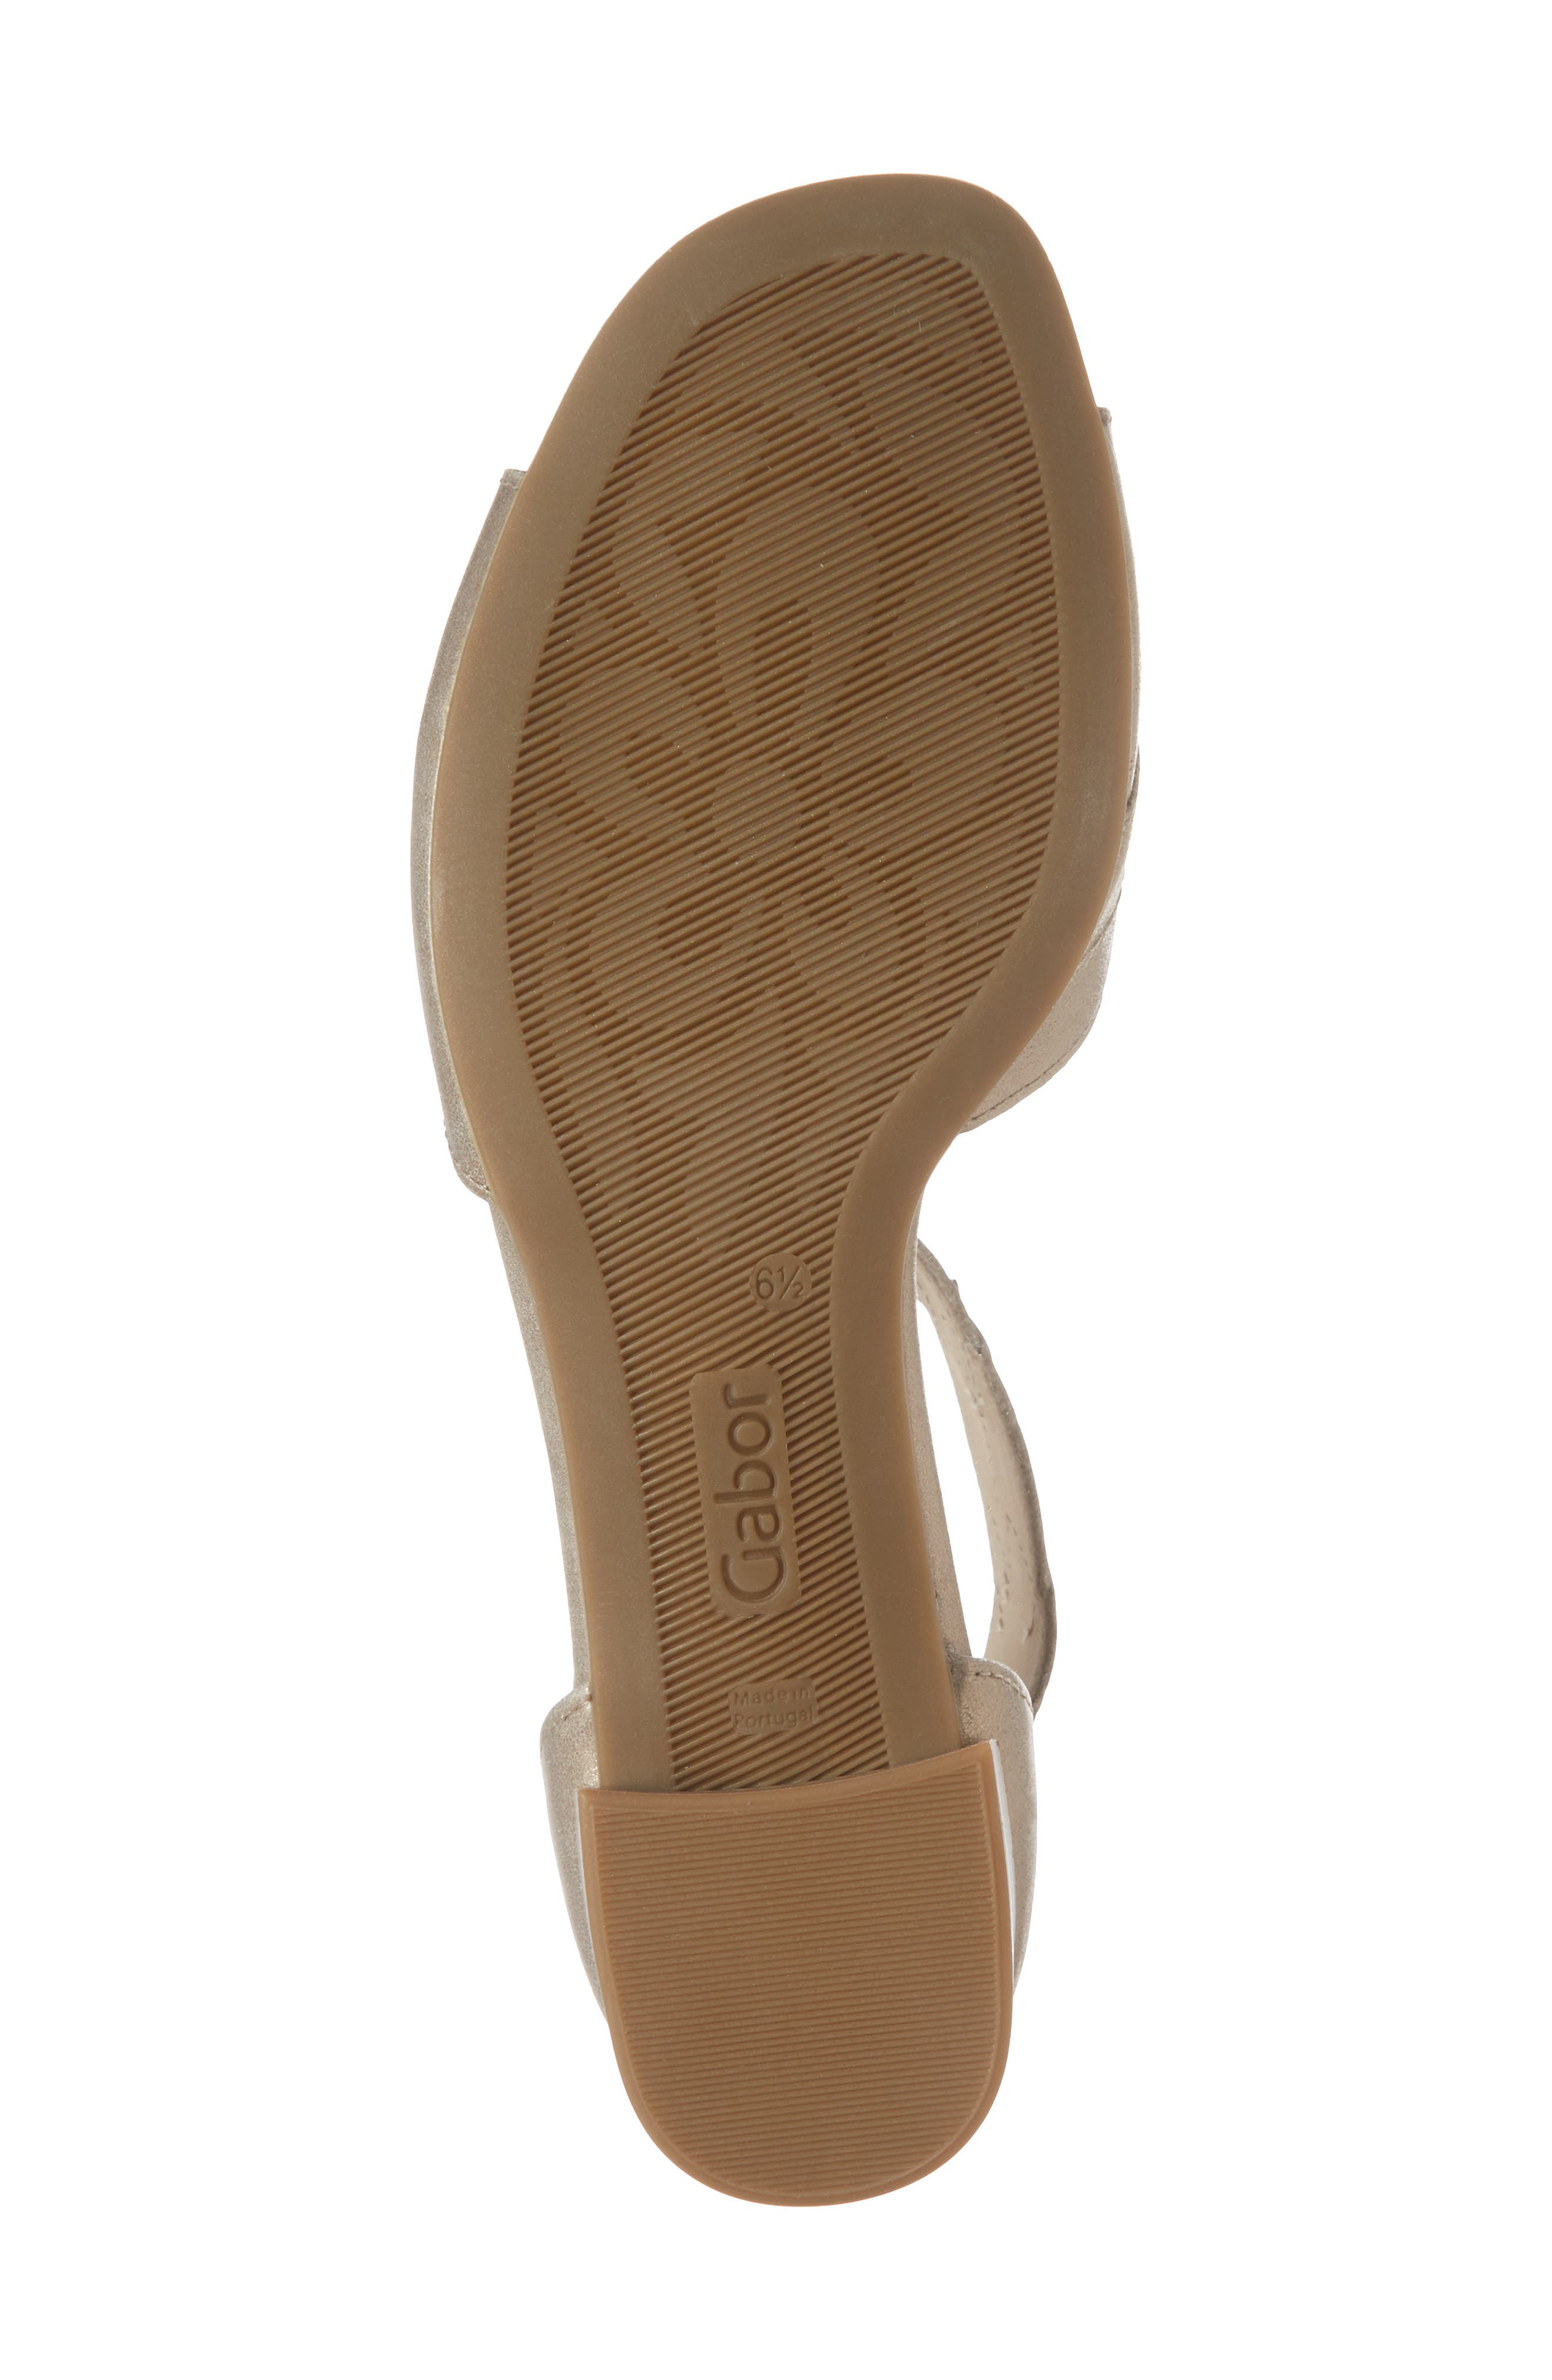 Leaf Ankle Strap Sandal,                             Alternate thumbnail 6, color,                             BEIGE METALLIC LEATHER